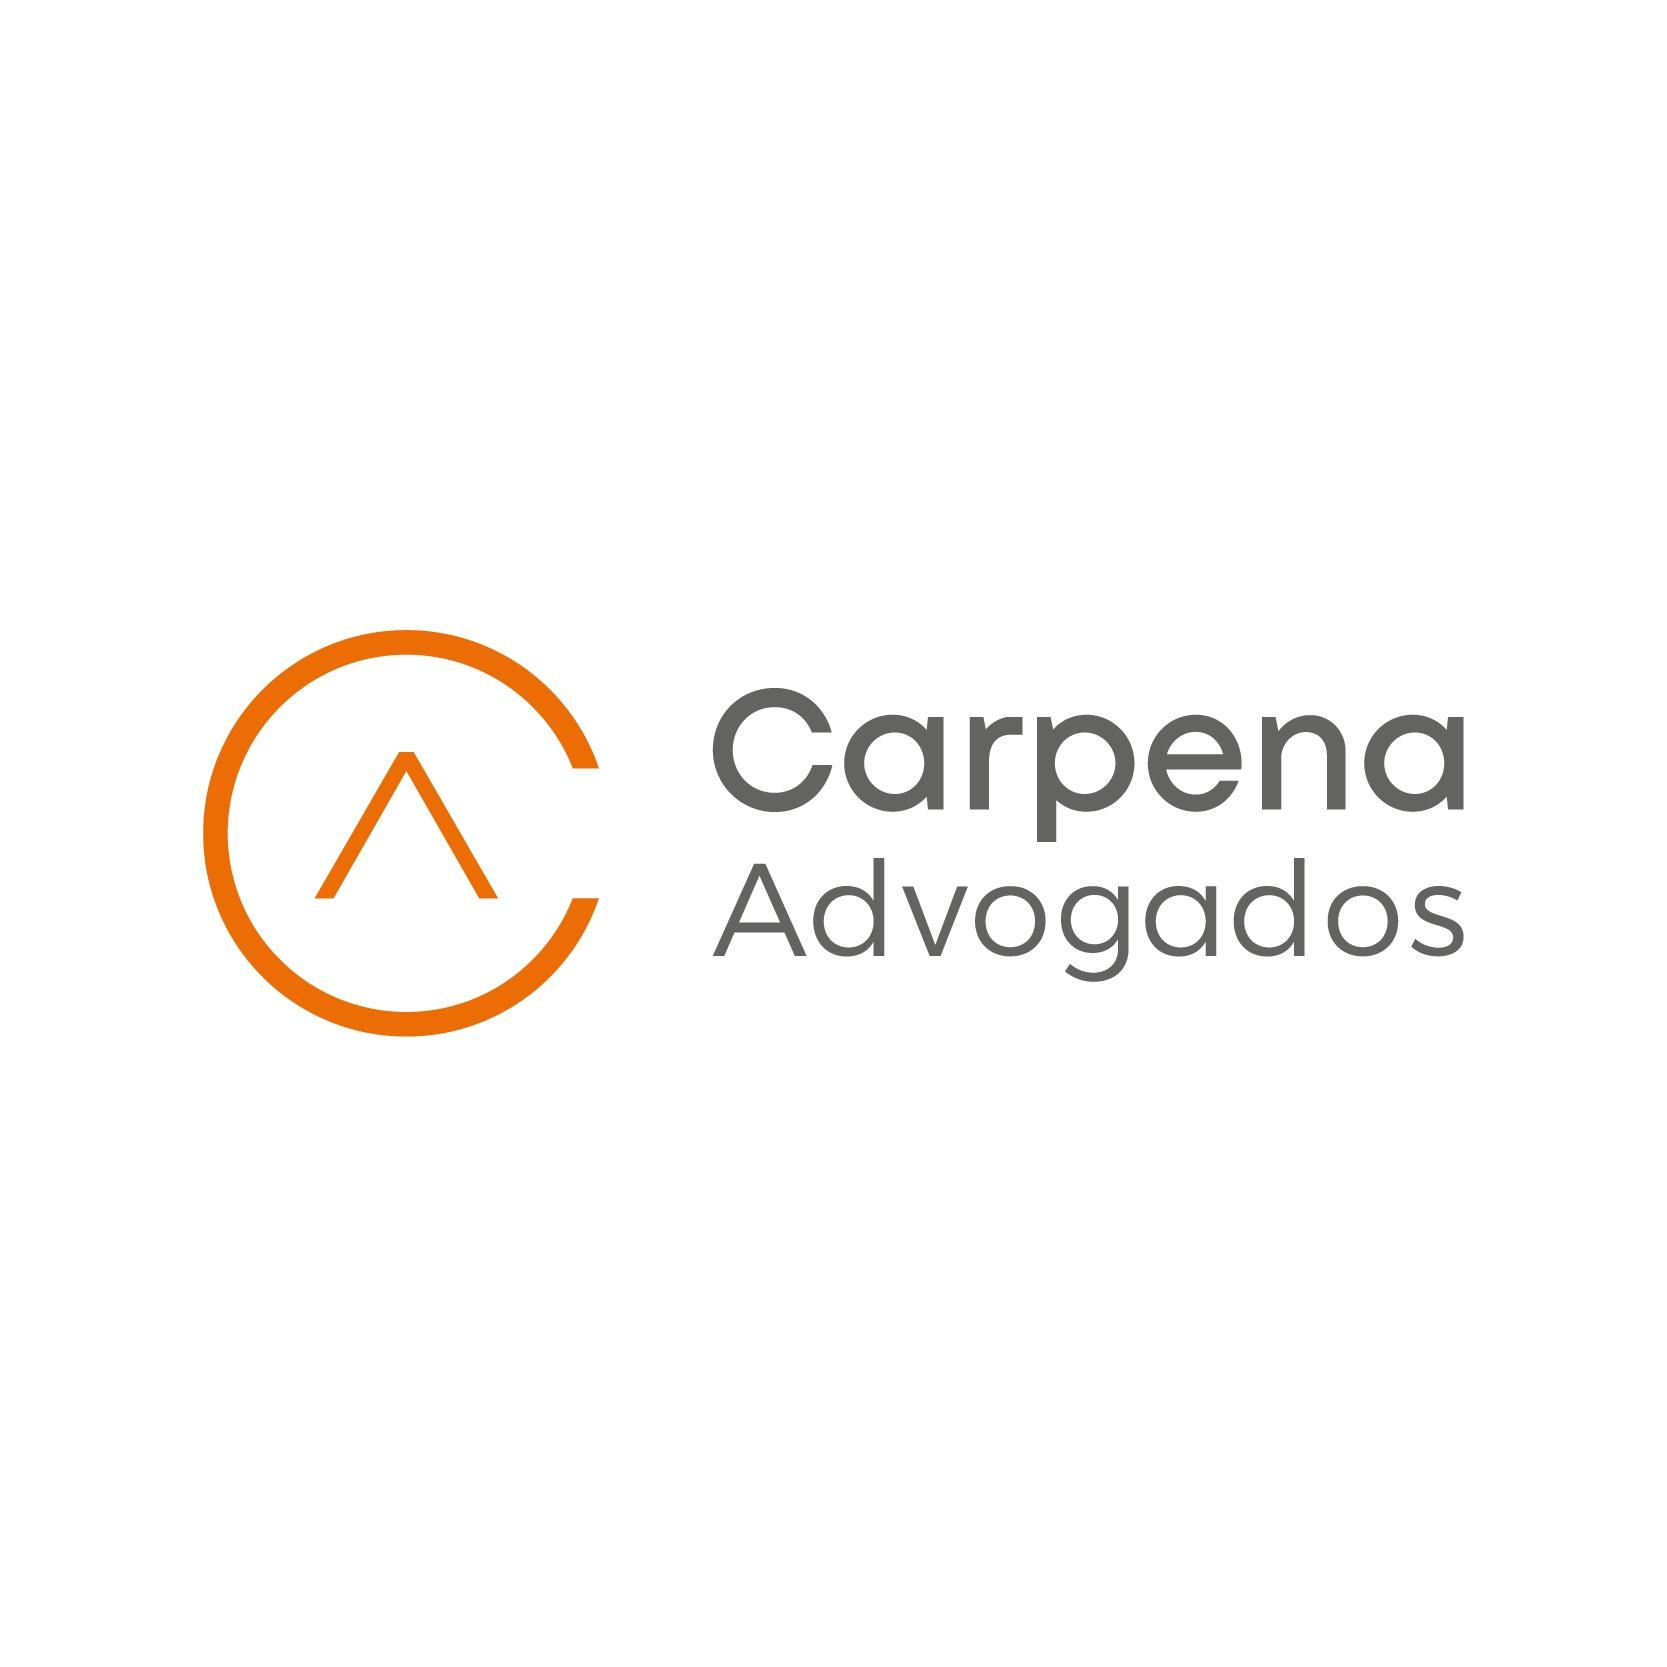 the Carpena Advogados logo.